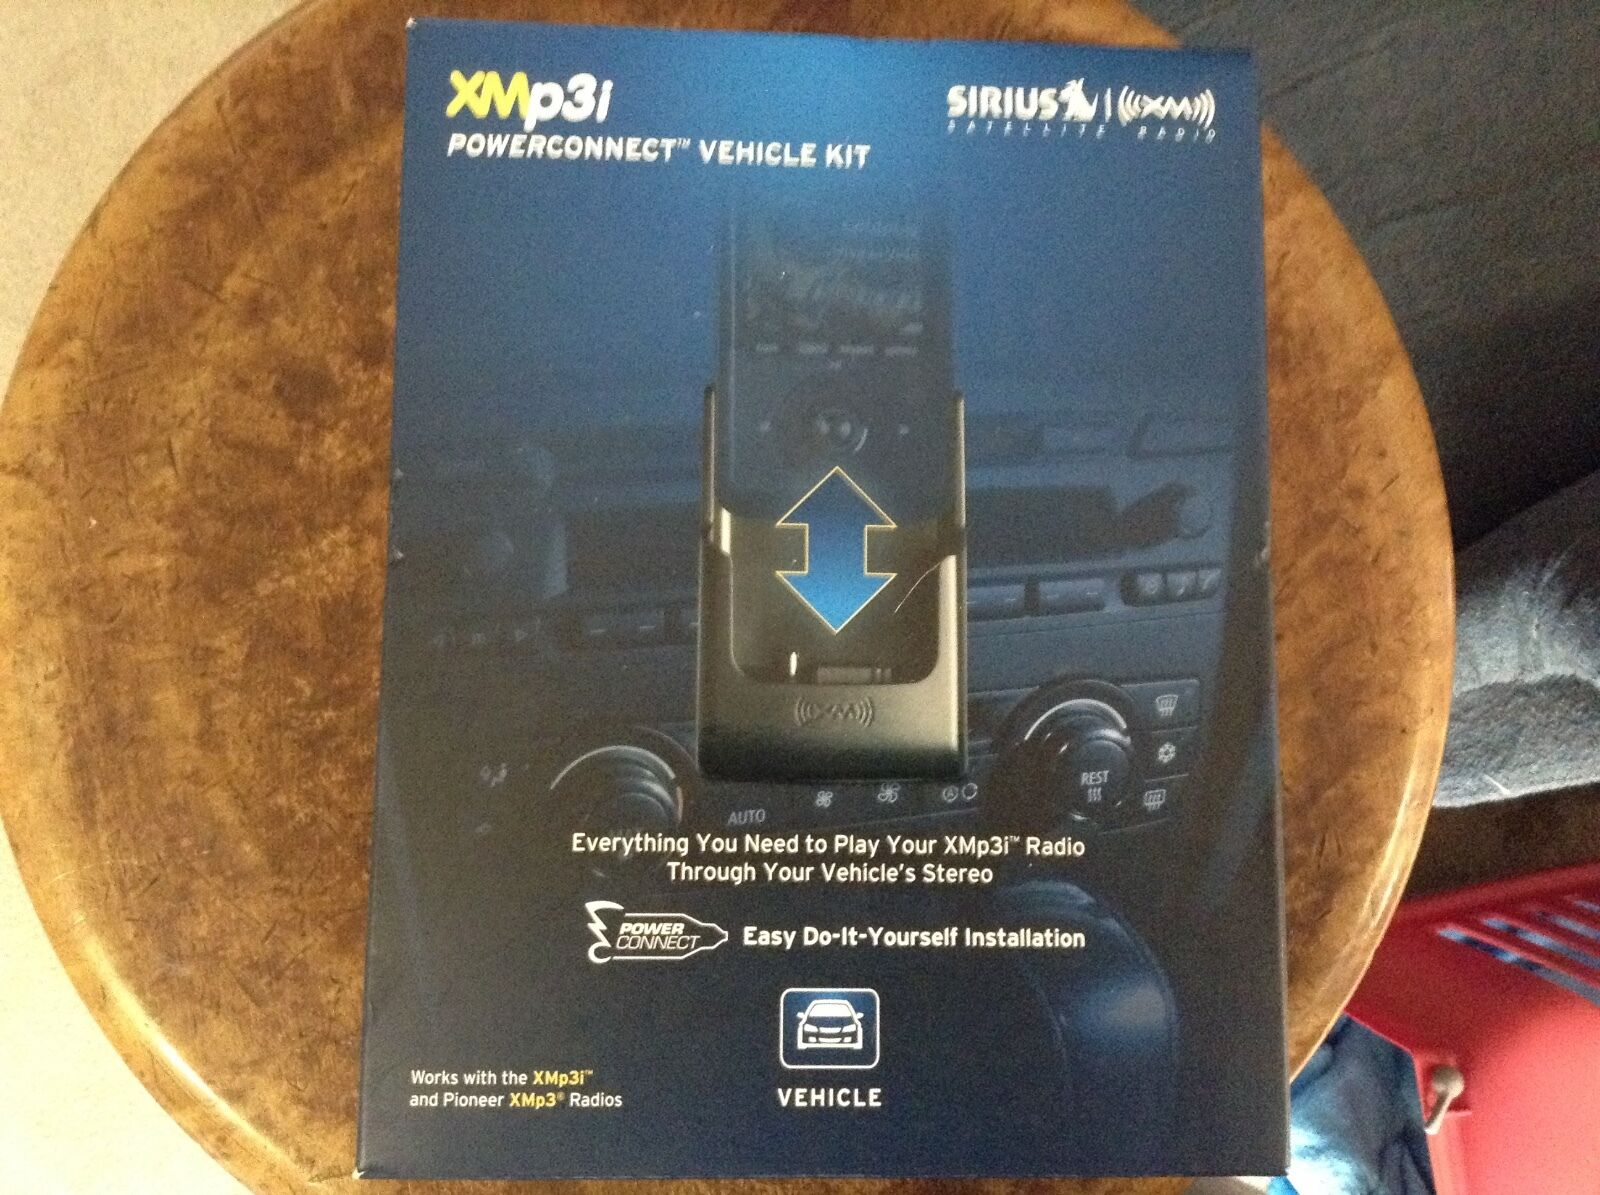 NEW SEALED AudioVox sirius XM XAPV2 PowerConnect car Vehicle Kit XMp3i xmp3